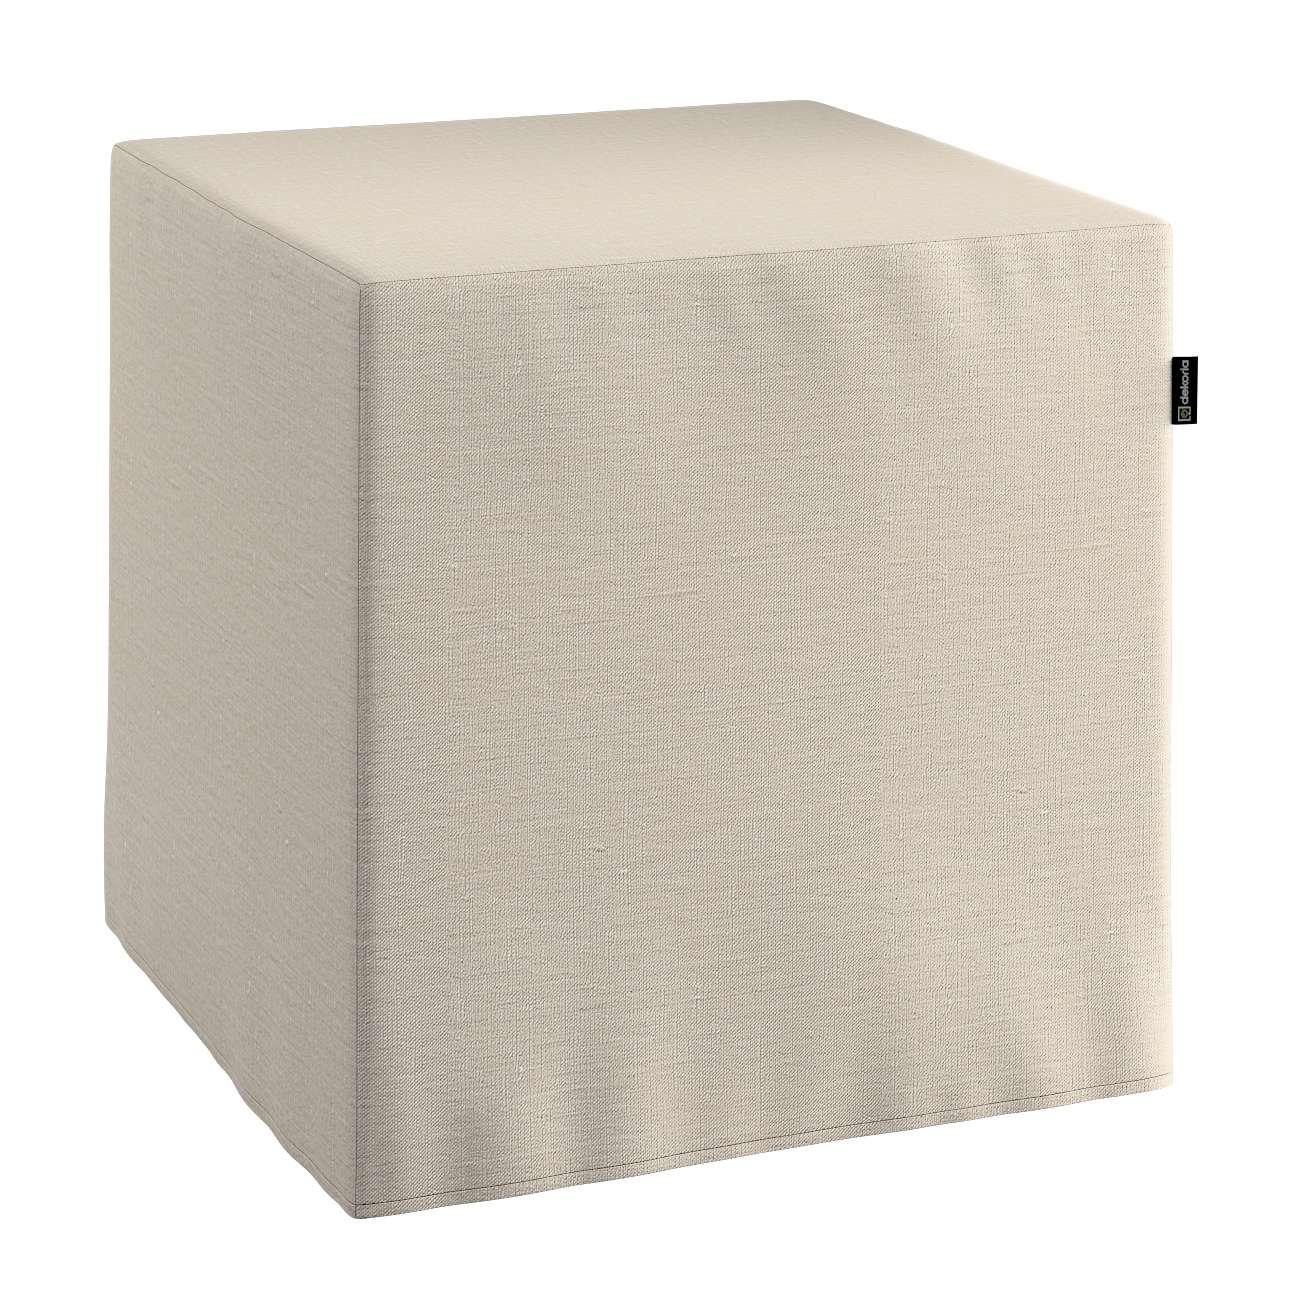 Pufo užvalkalas 40x40x40 cm kubas kolekcijoje Linen , audinys: 392-05